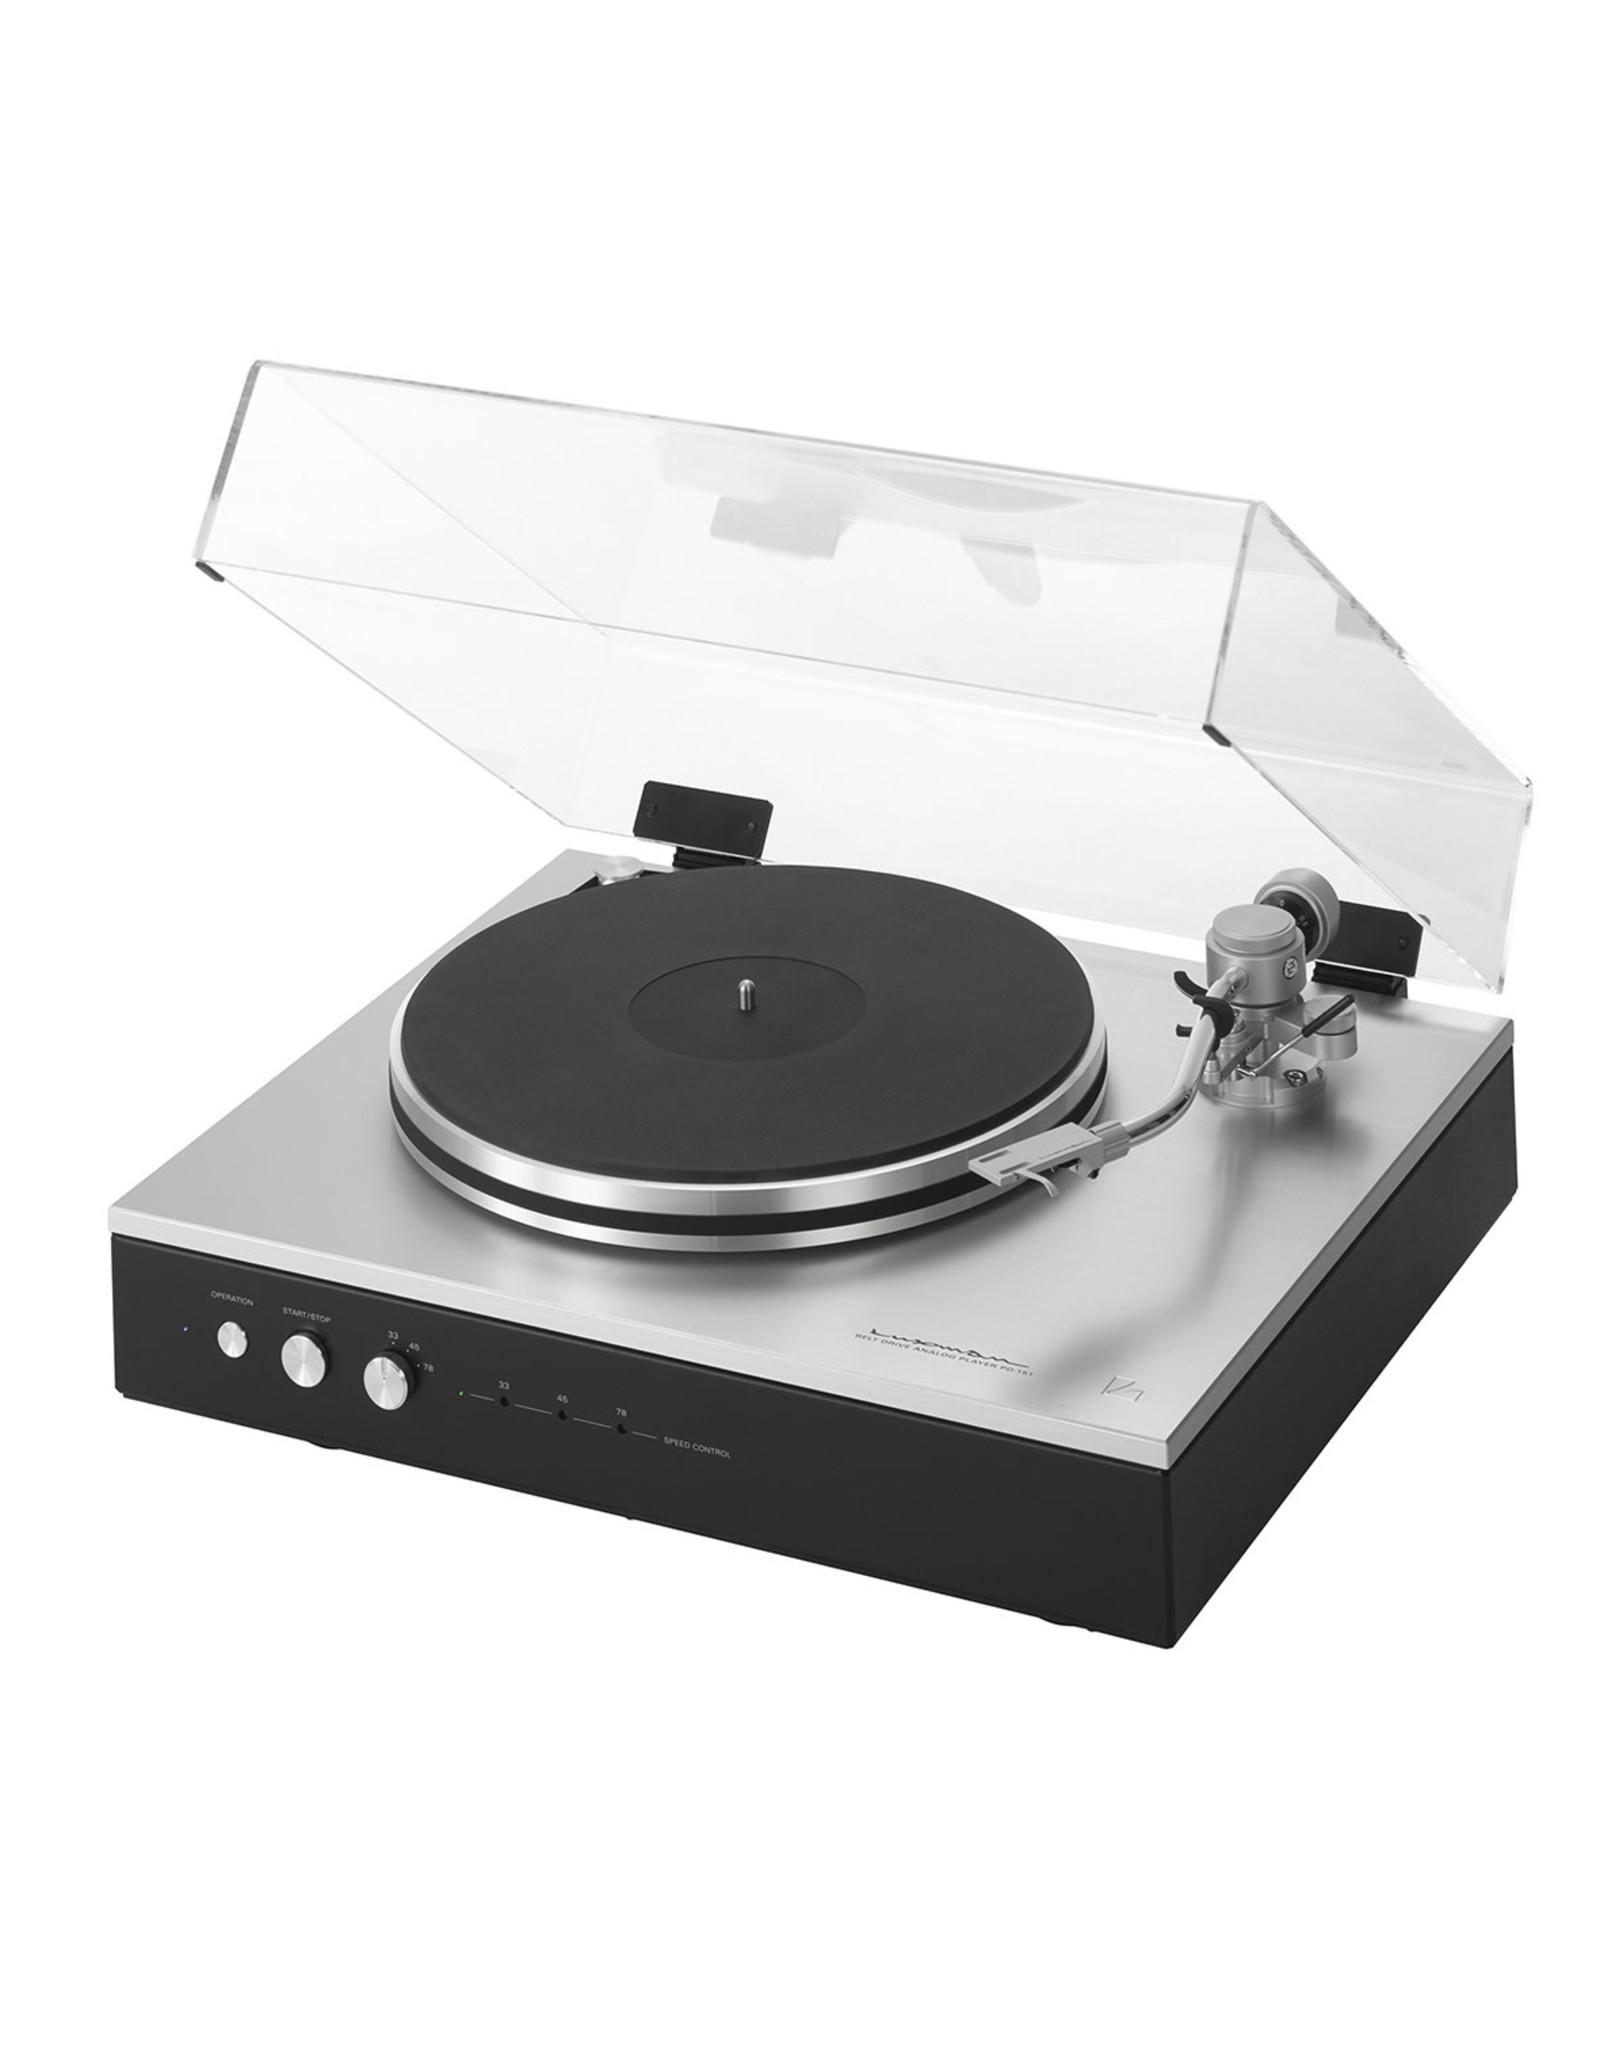 Luxman Luxman PD-151 Dustcover